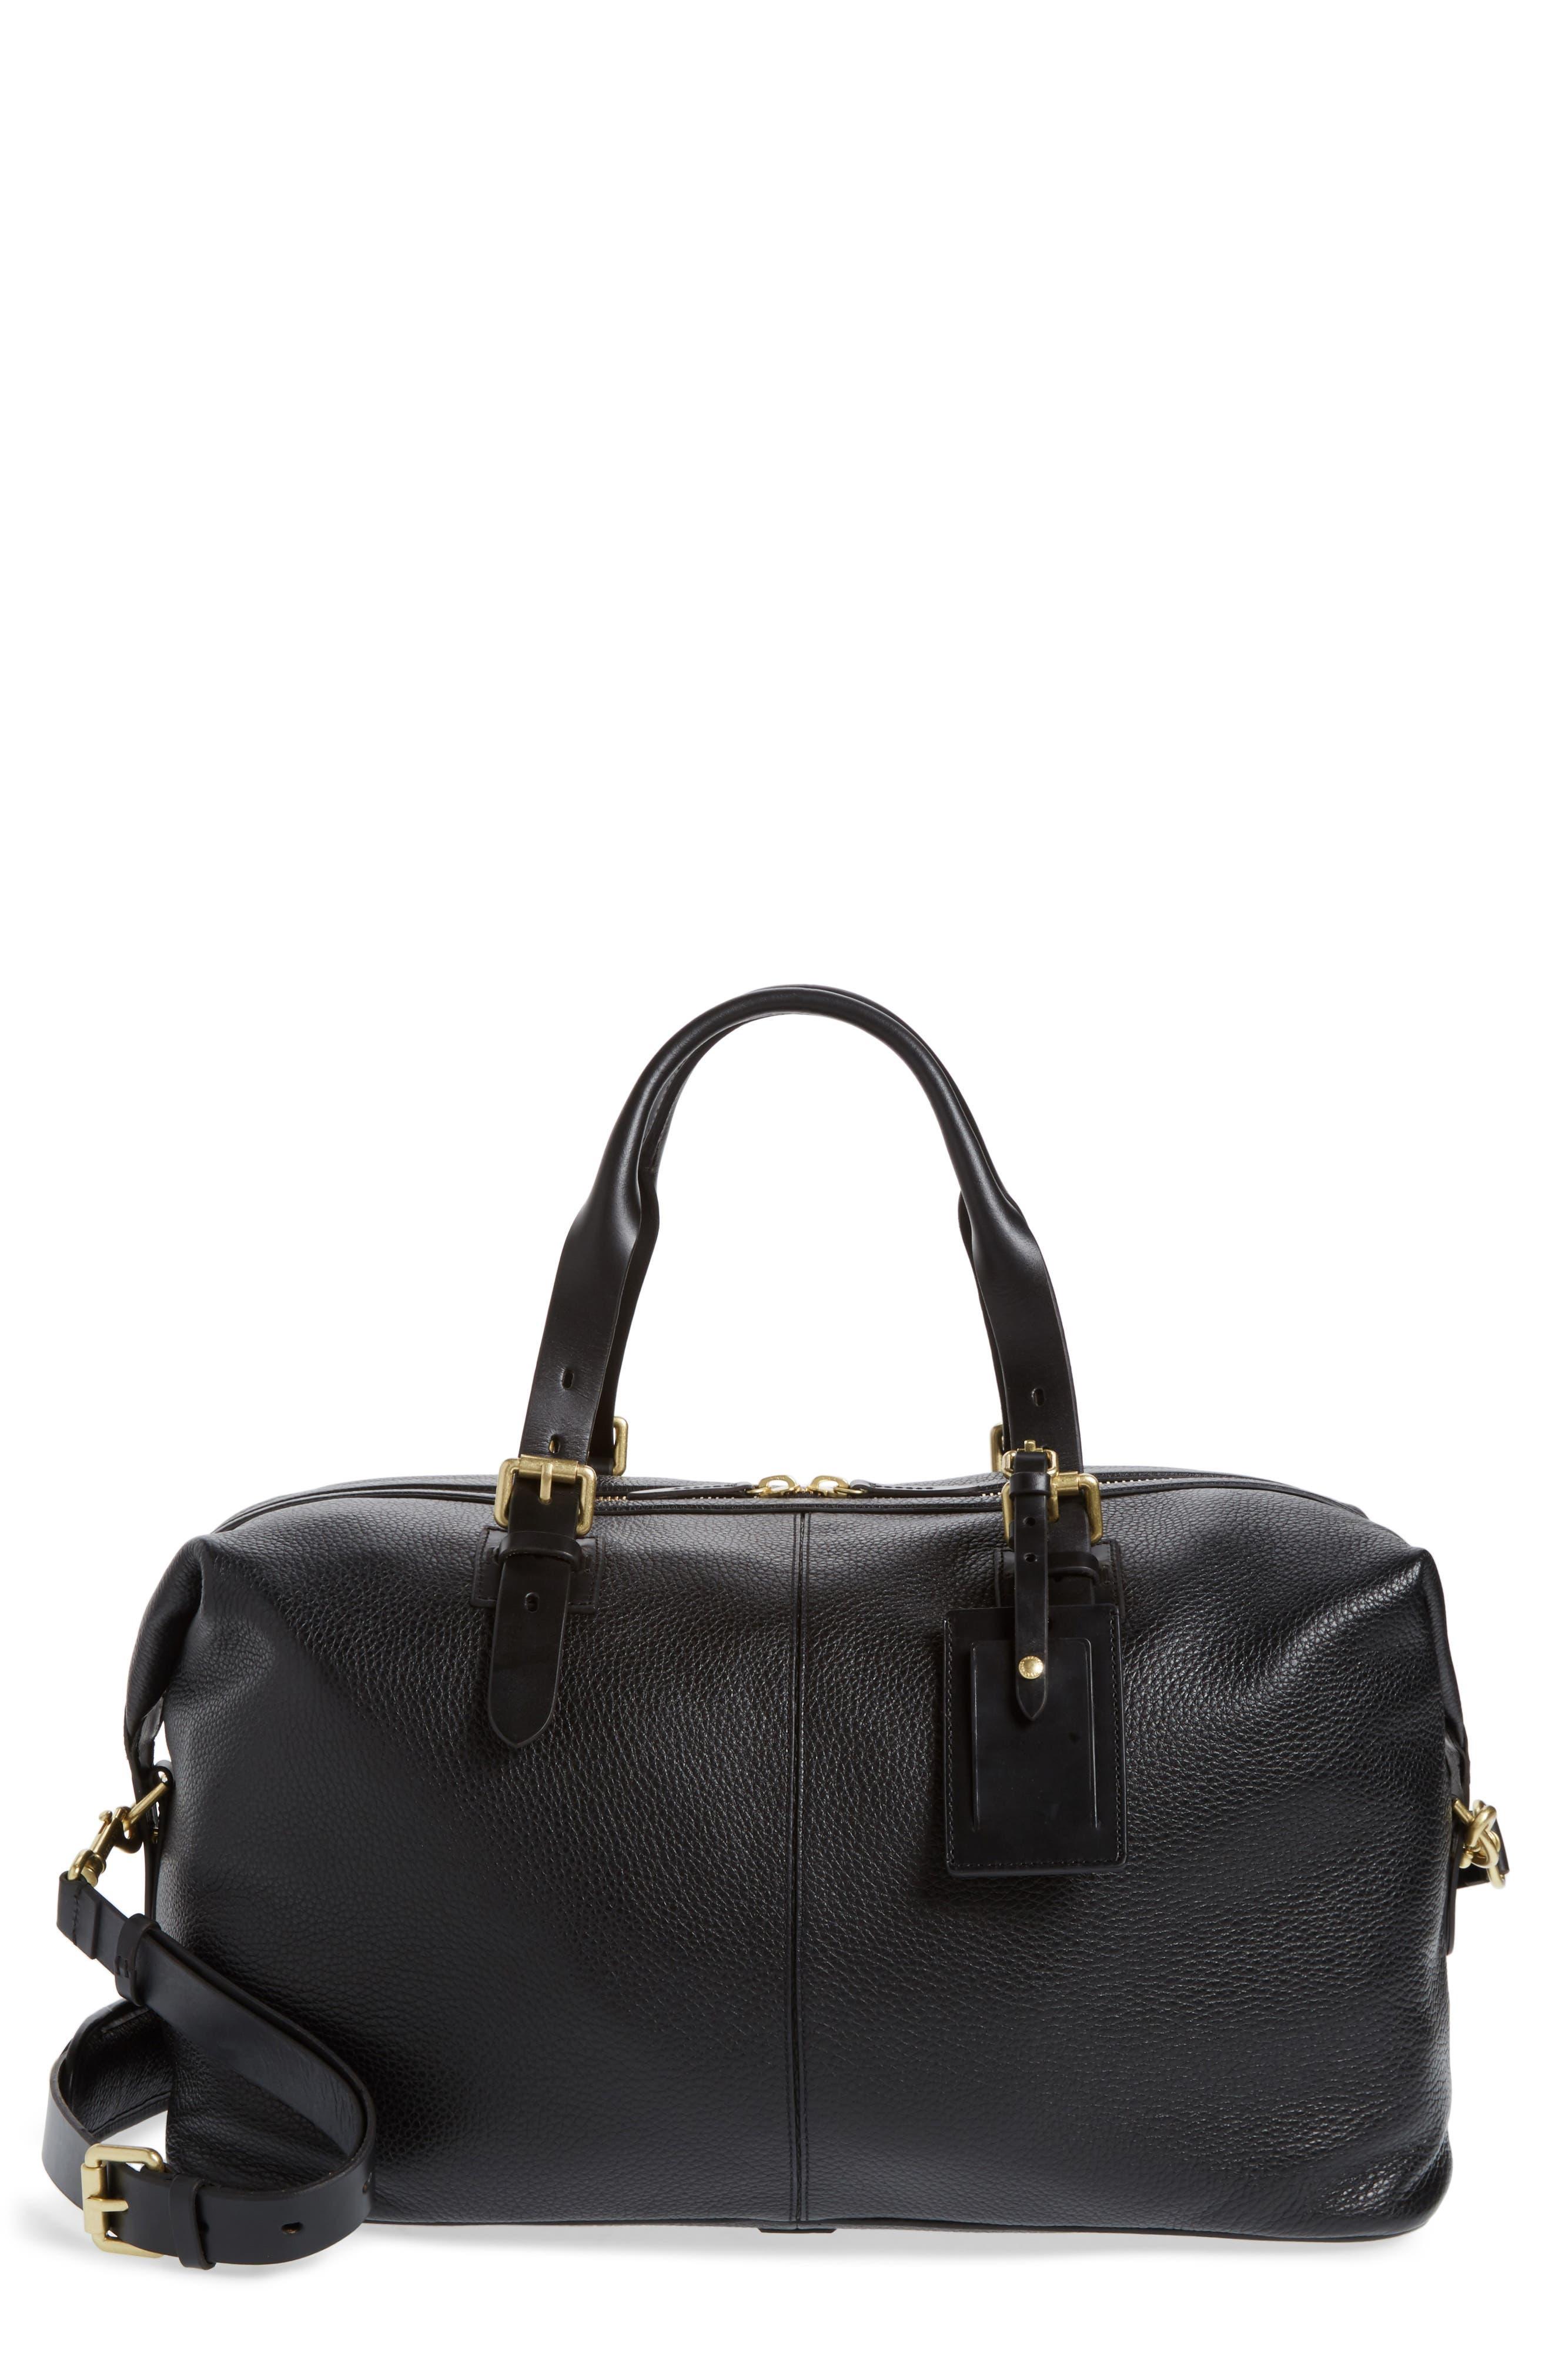 Leather Duffel Bag,                             Main thumbnail 1, color,                             Black